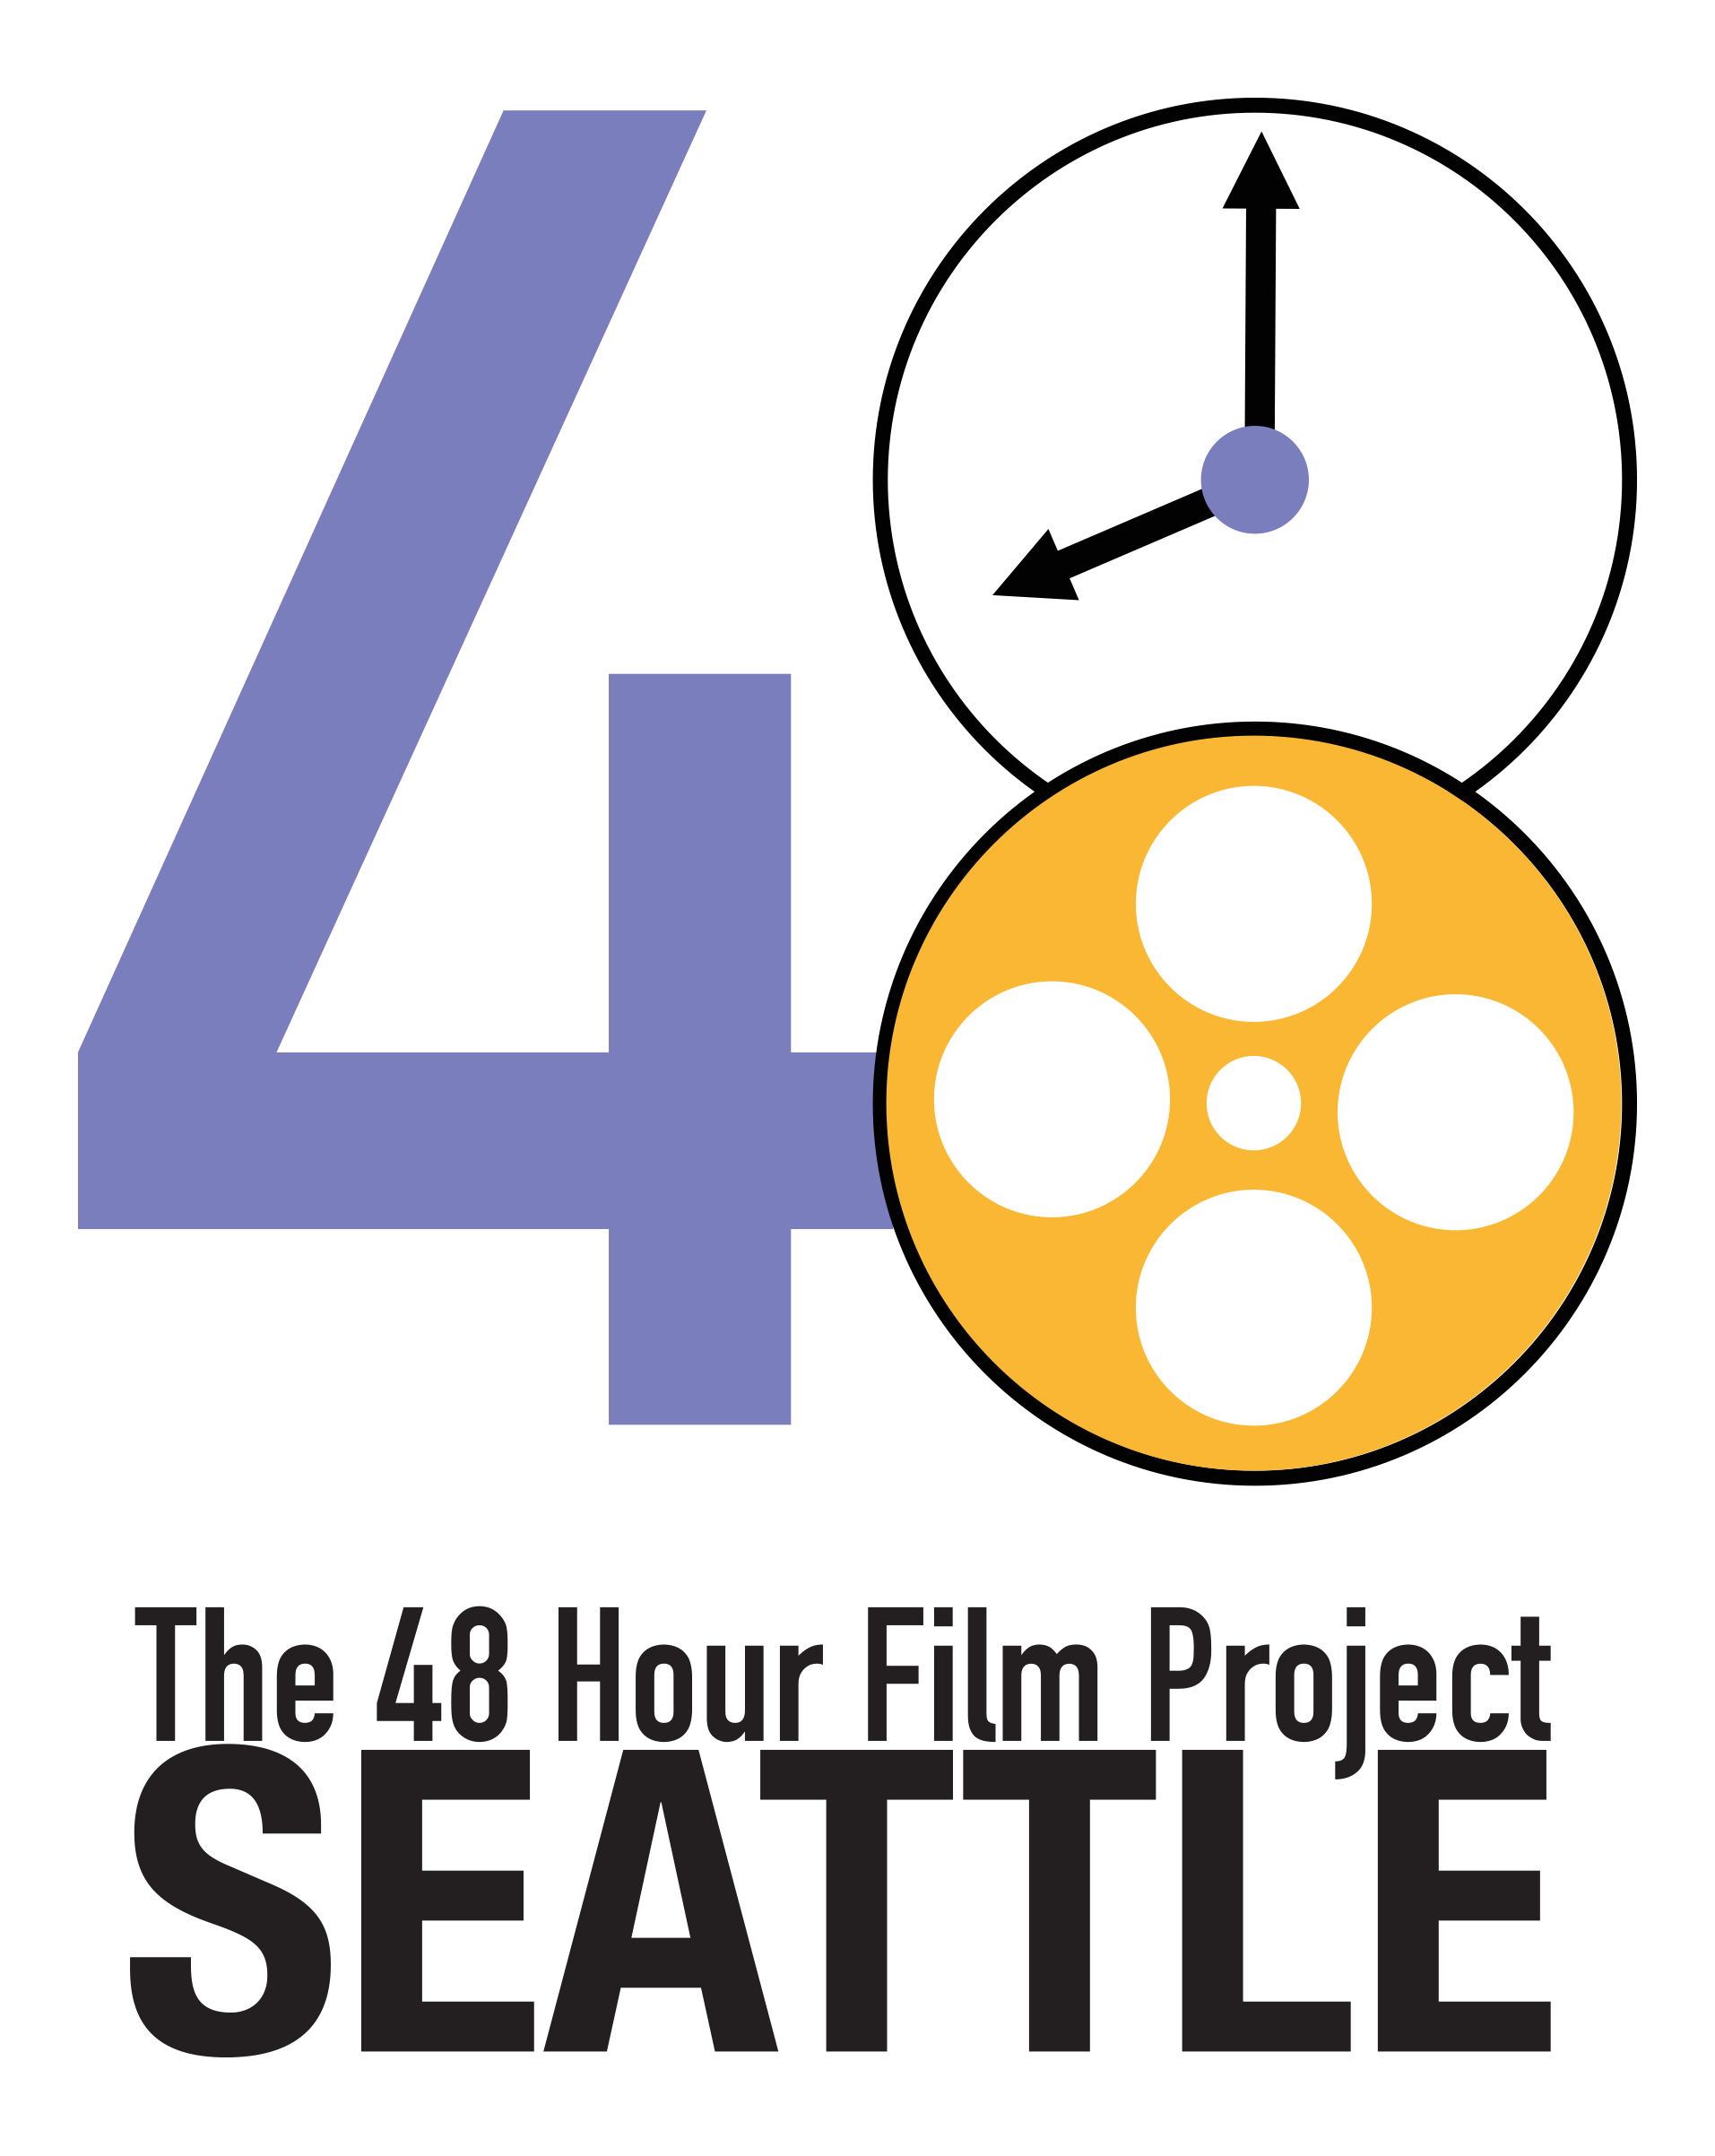 Sea48HFP-logo.png